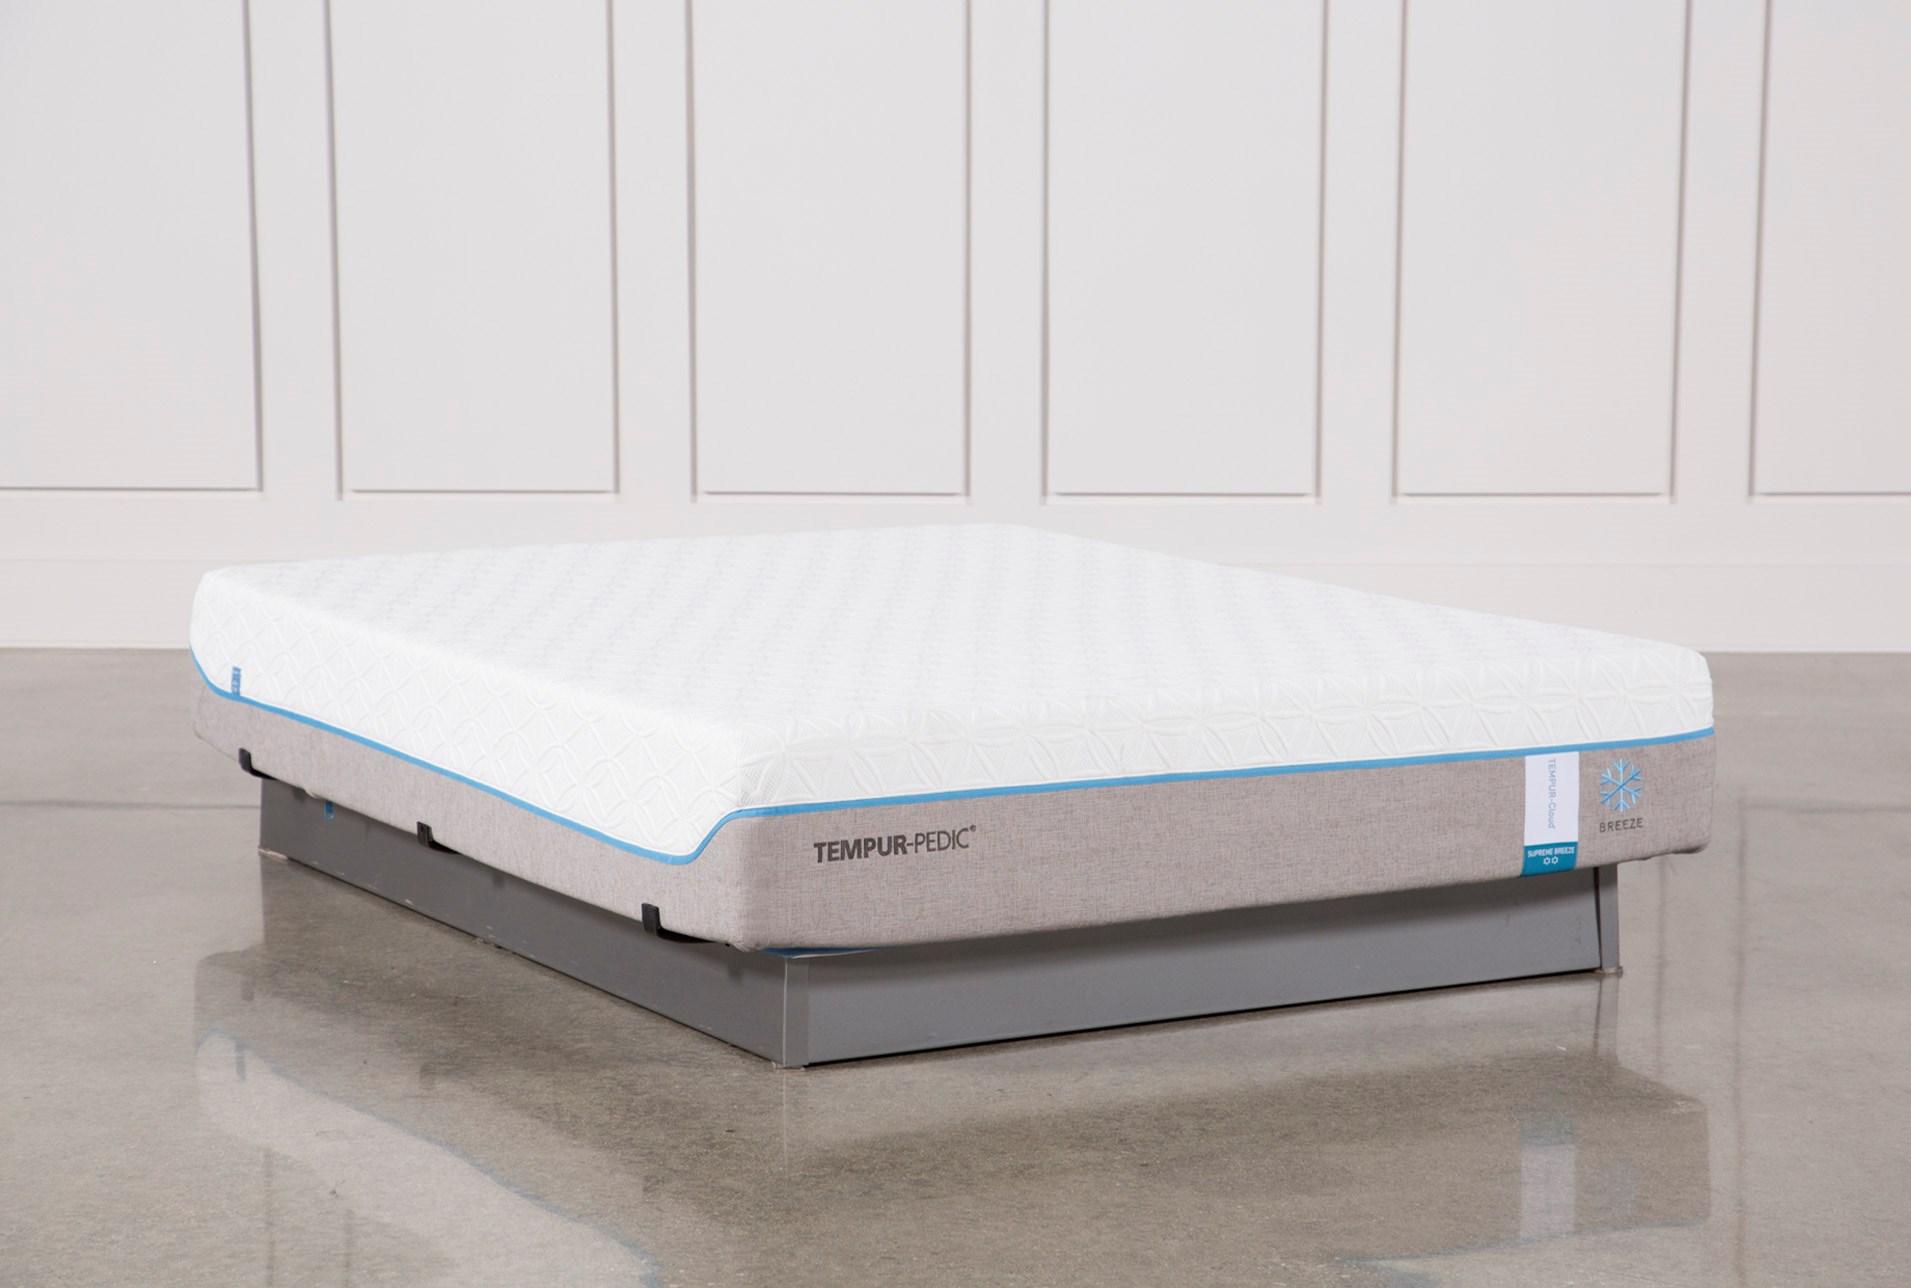 tempur pedic cloud supreme flex supreme tempurpedic cloud supreme breeze 20 queen mattress qty 1 has been successfully added to your cart living spaces